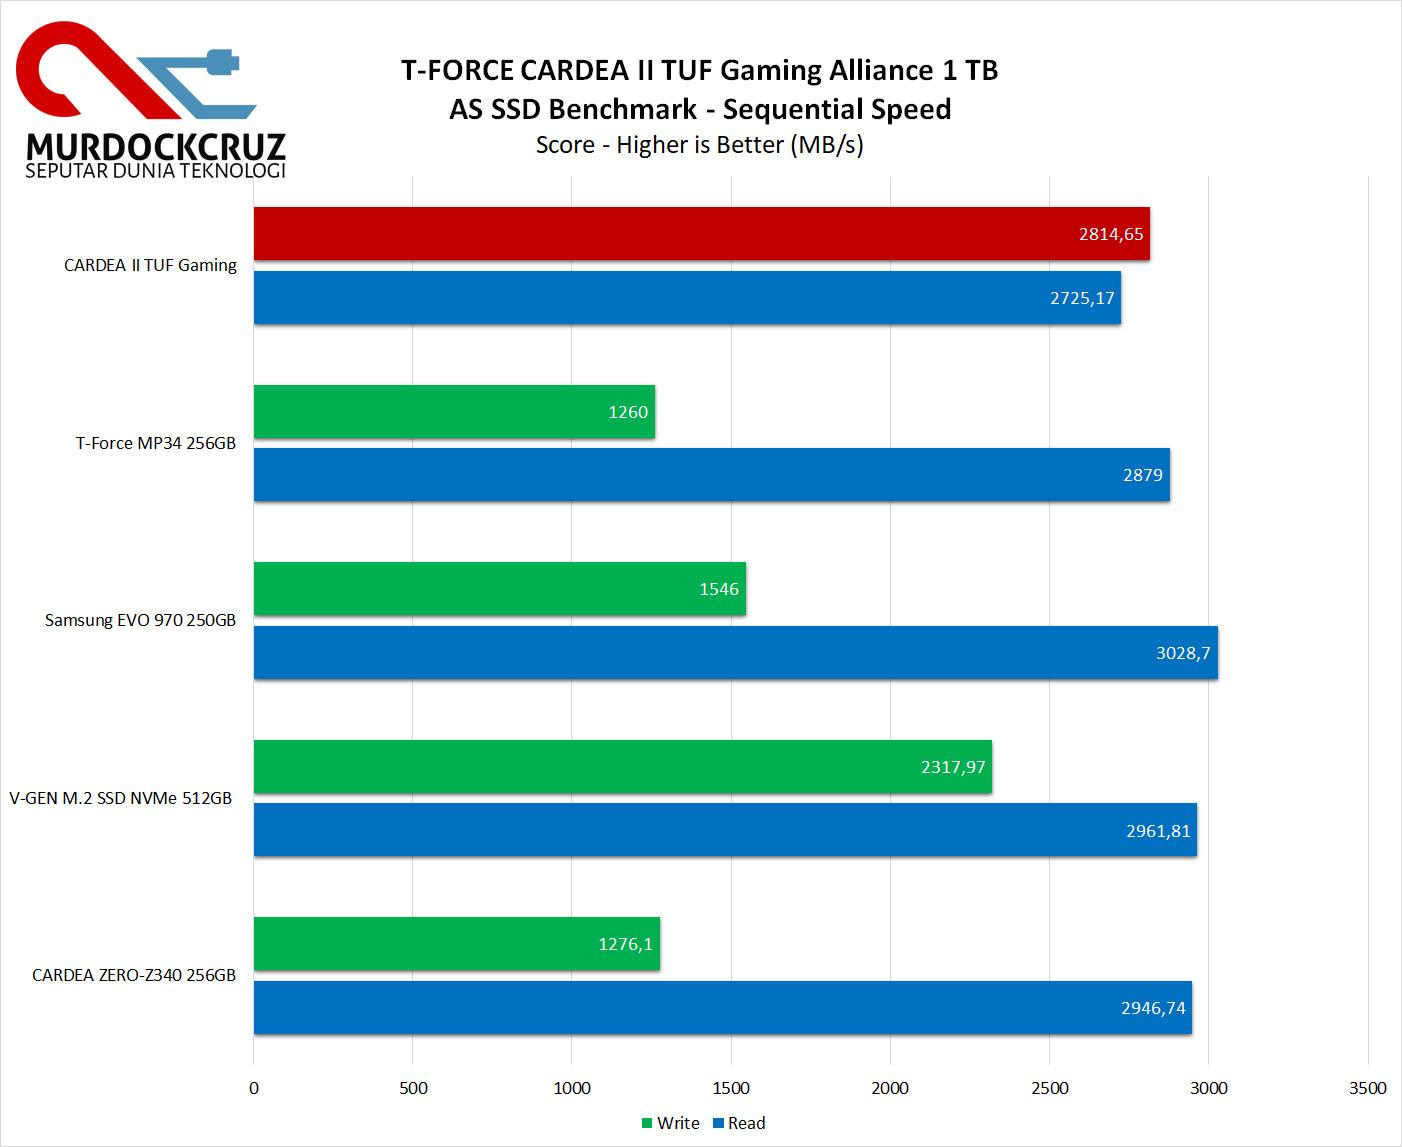 T-FORCE CARDEA II TUF Gaming Alliance